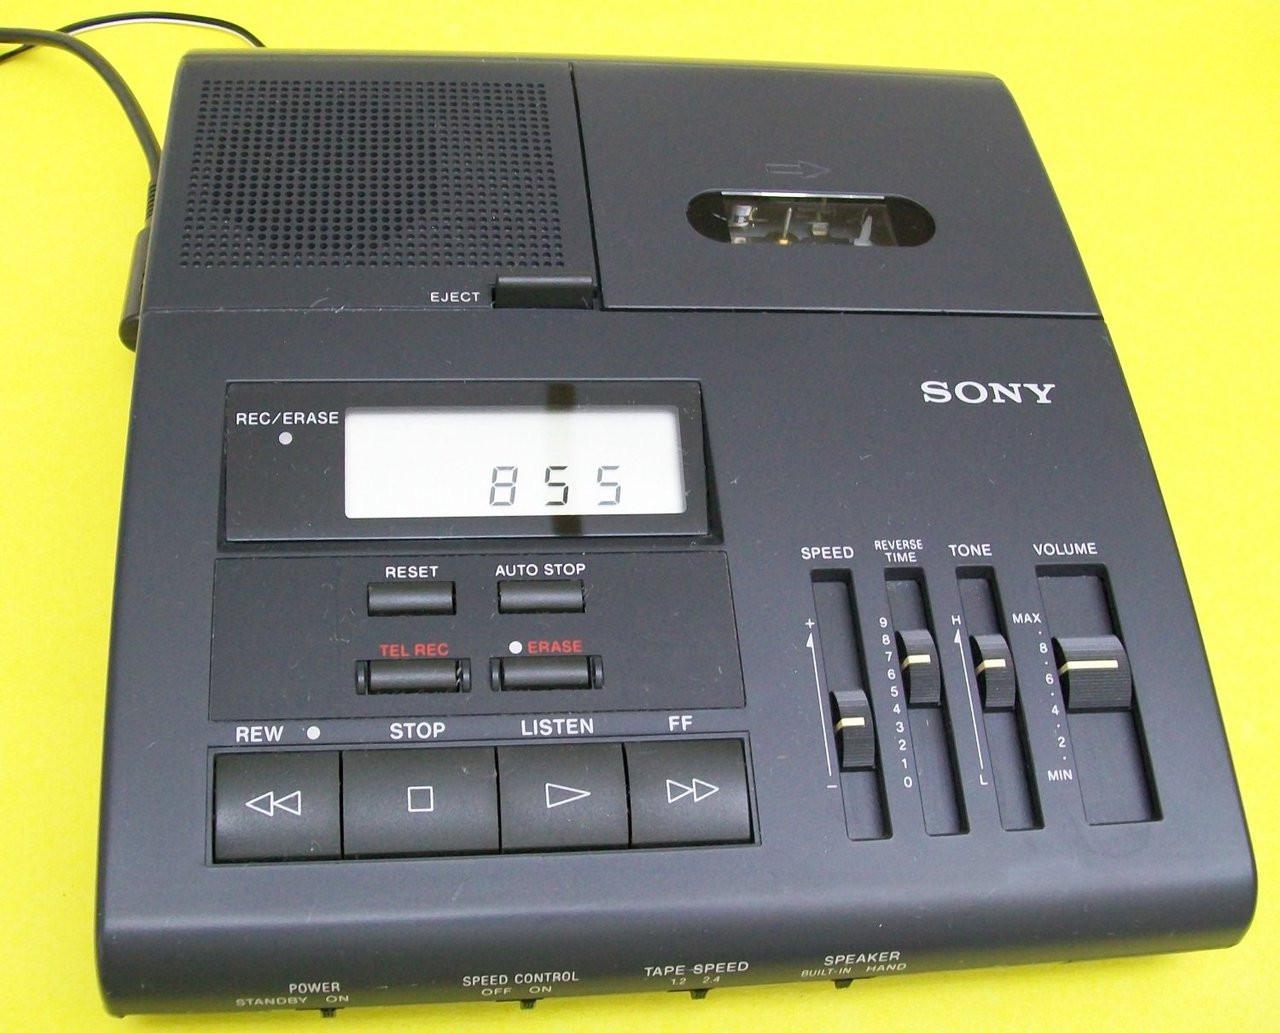 Sony Bm-850 Microcassette Transcription Transcriber Machine